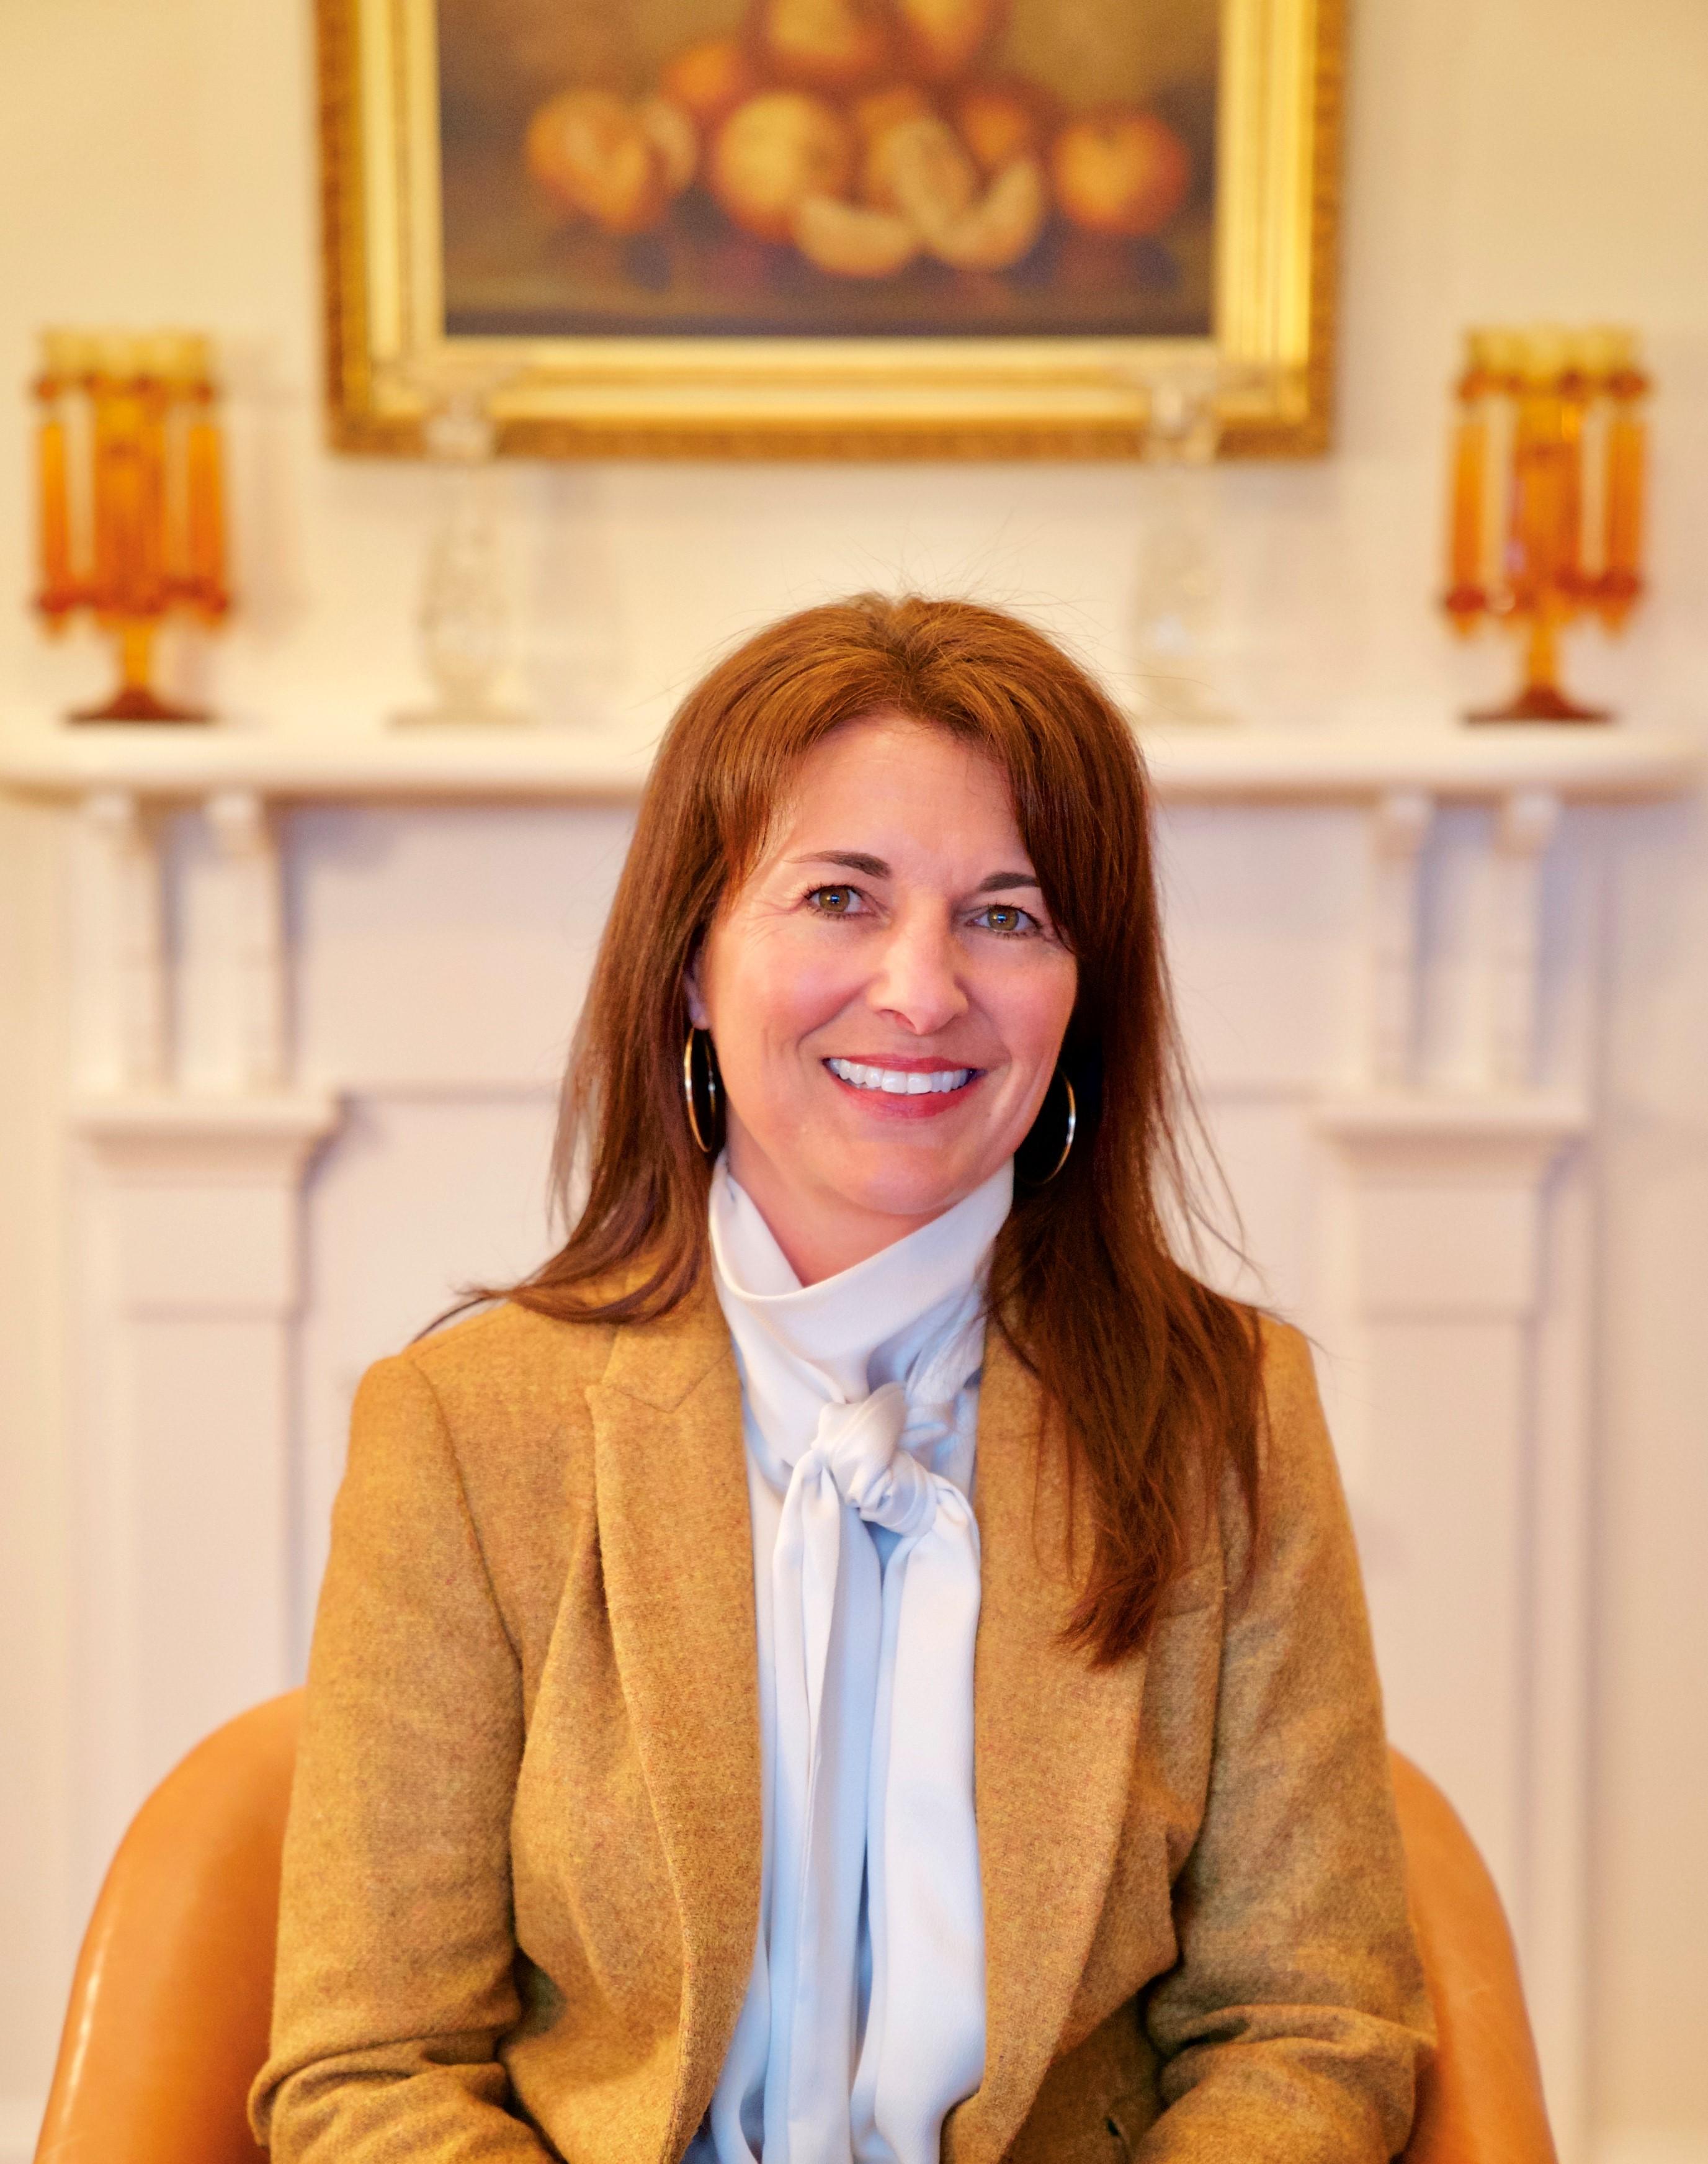 Lila Delman Real Estate International Names Kristen Paul-Jones Director of Business Development